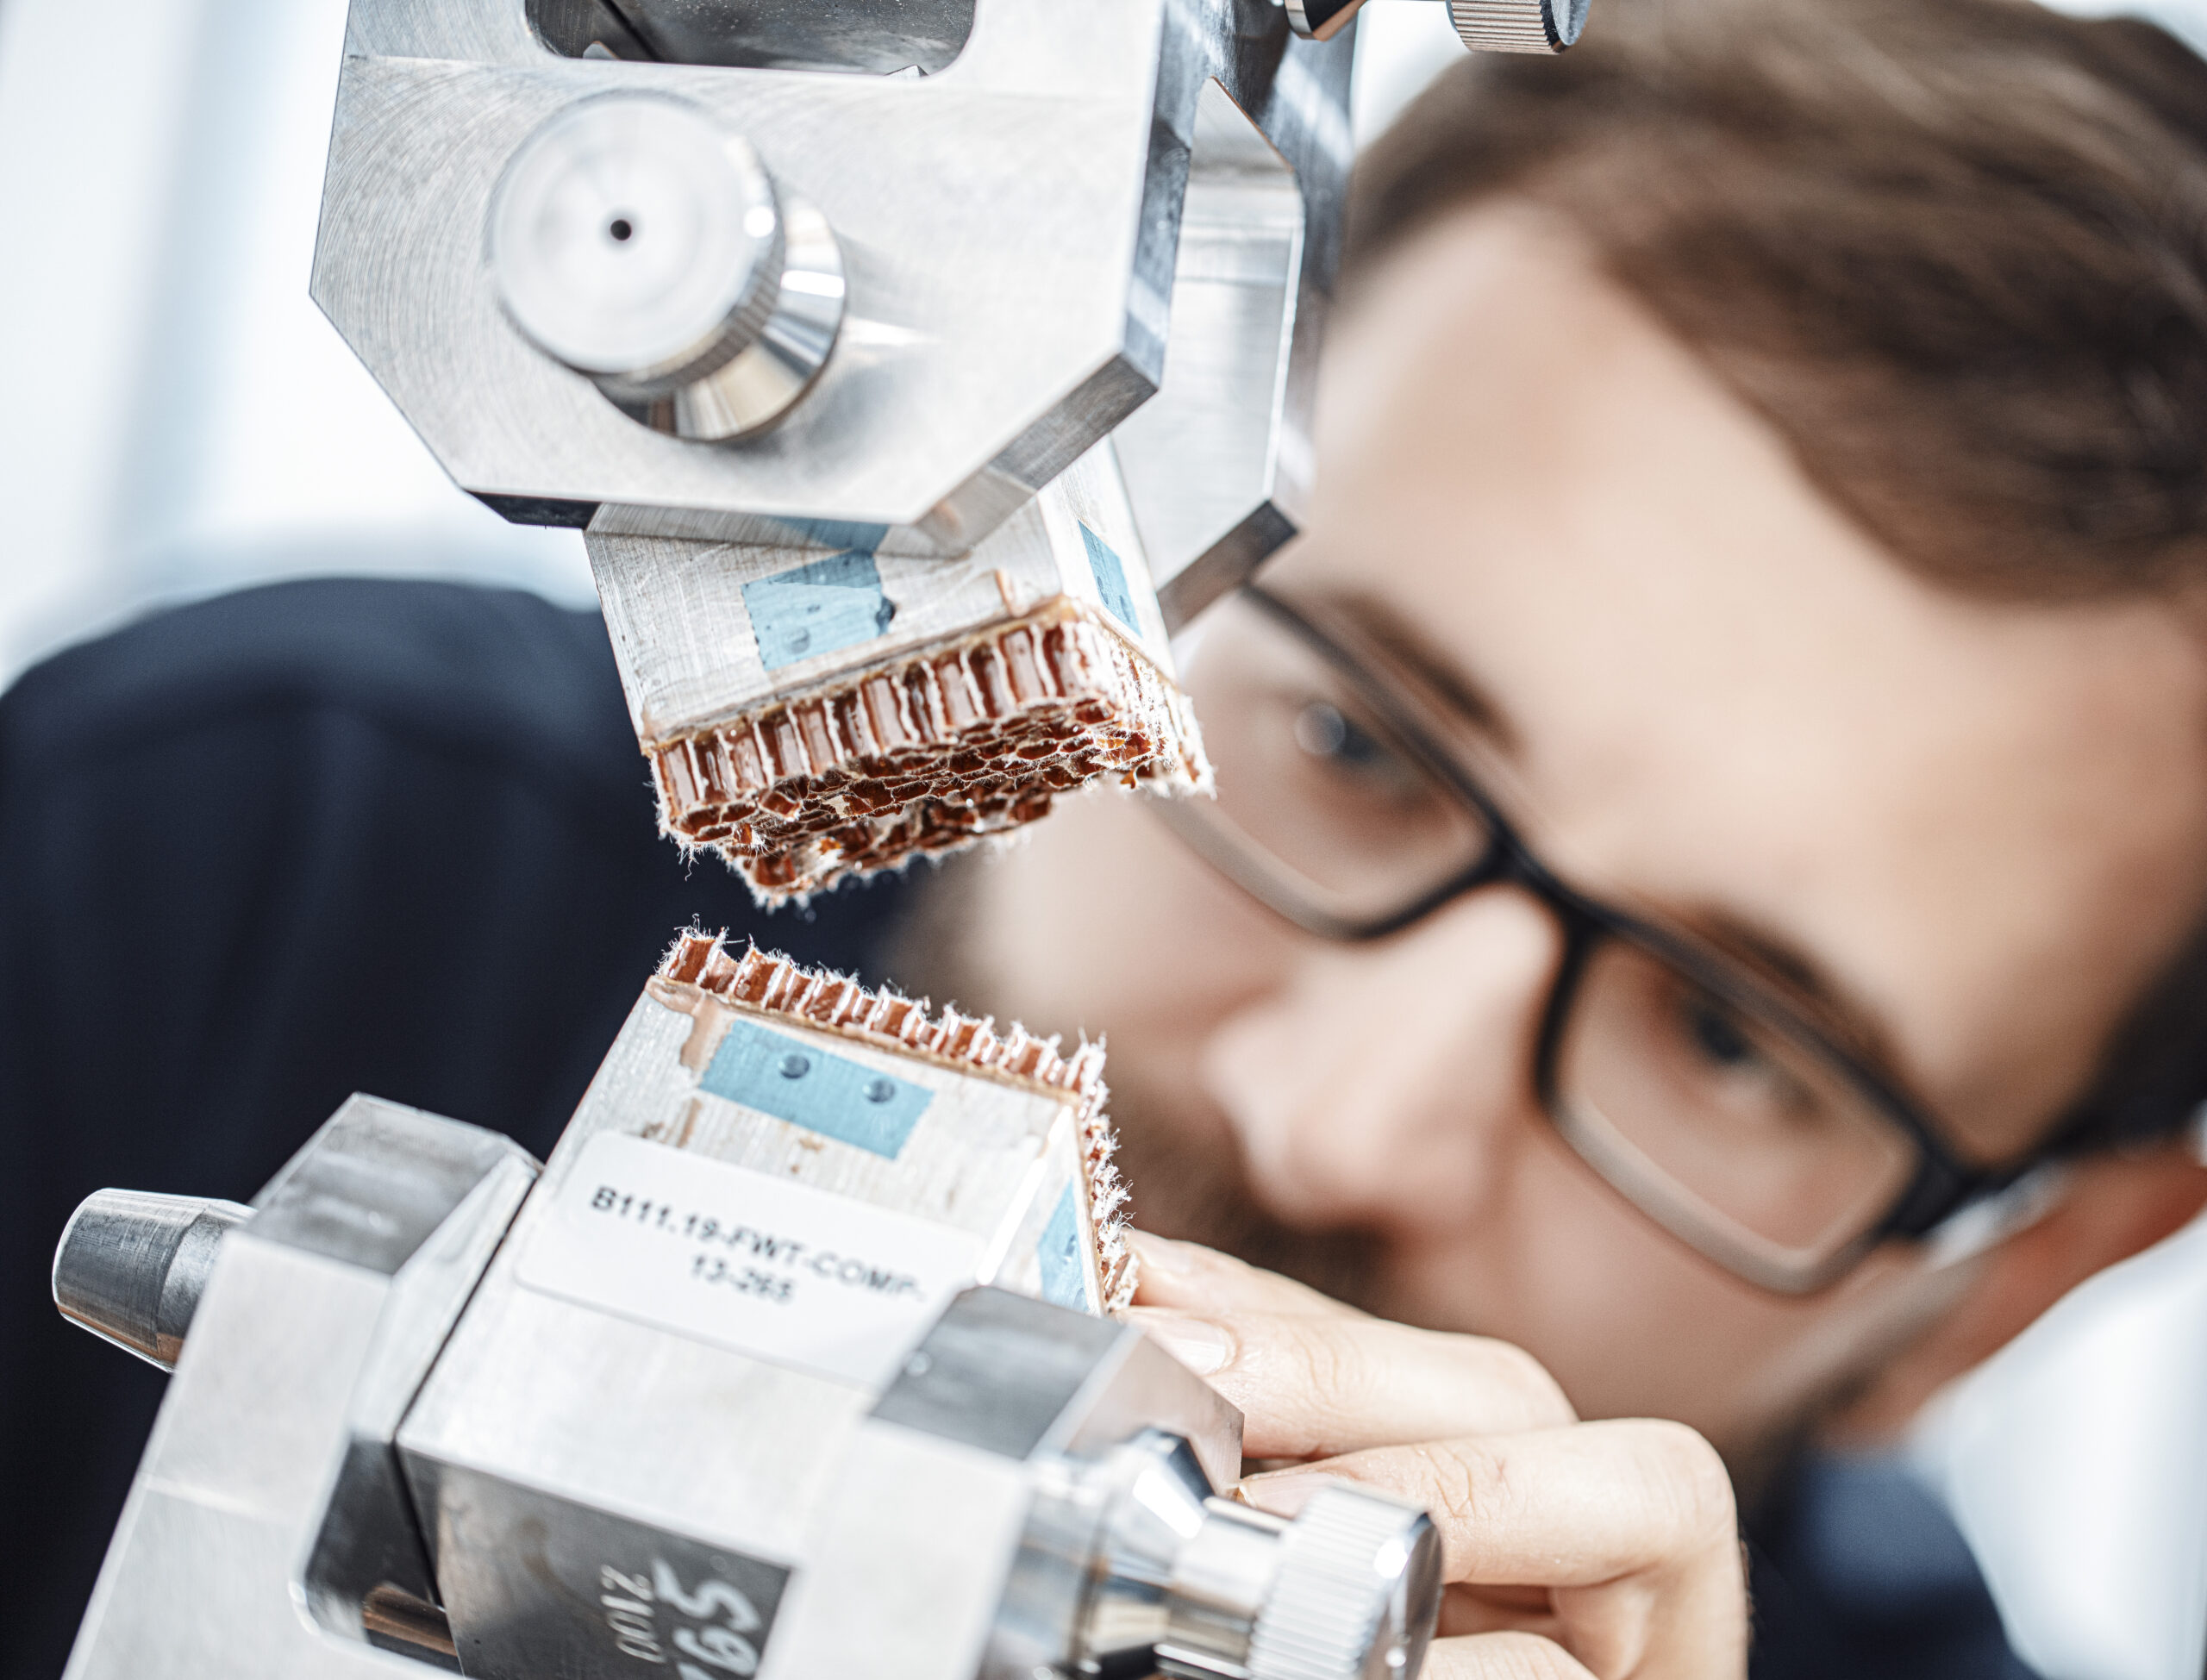 Material Testing for Metals, Plastics and Composites